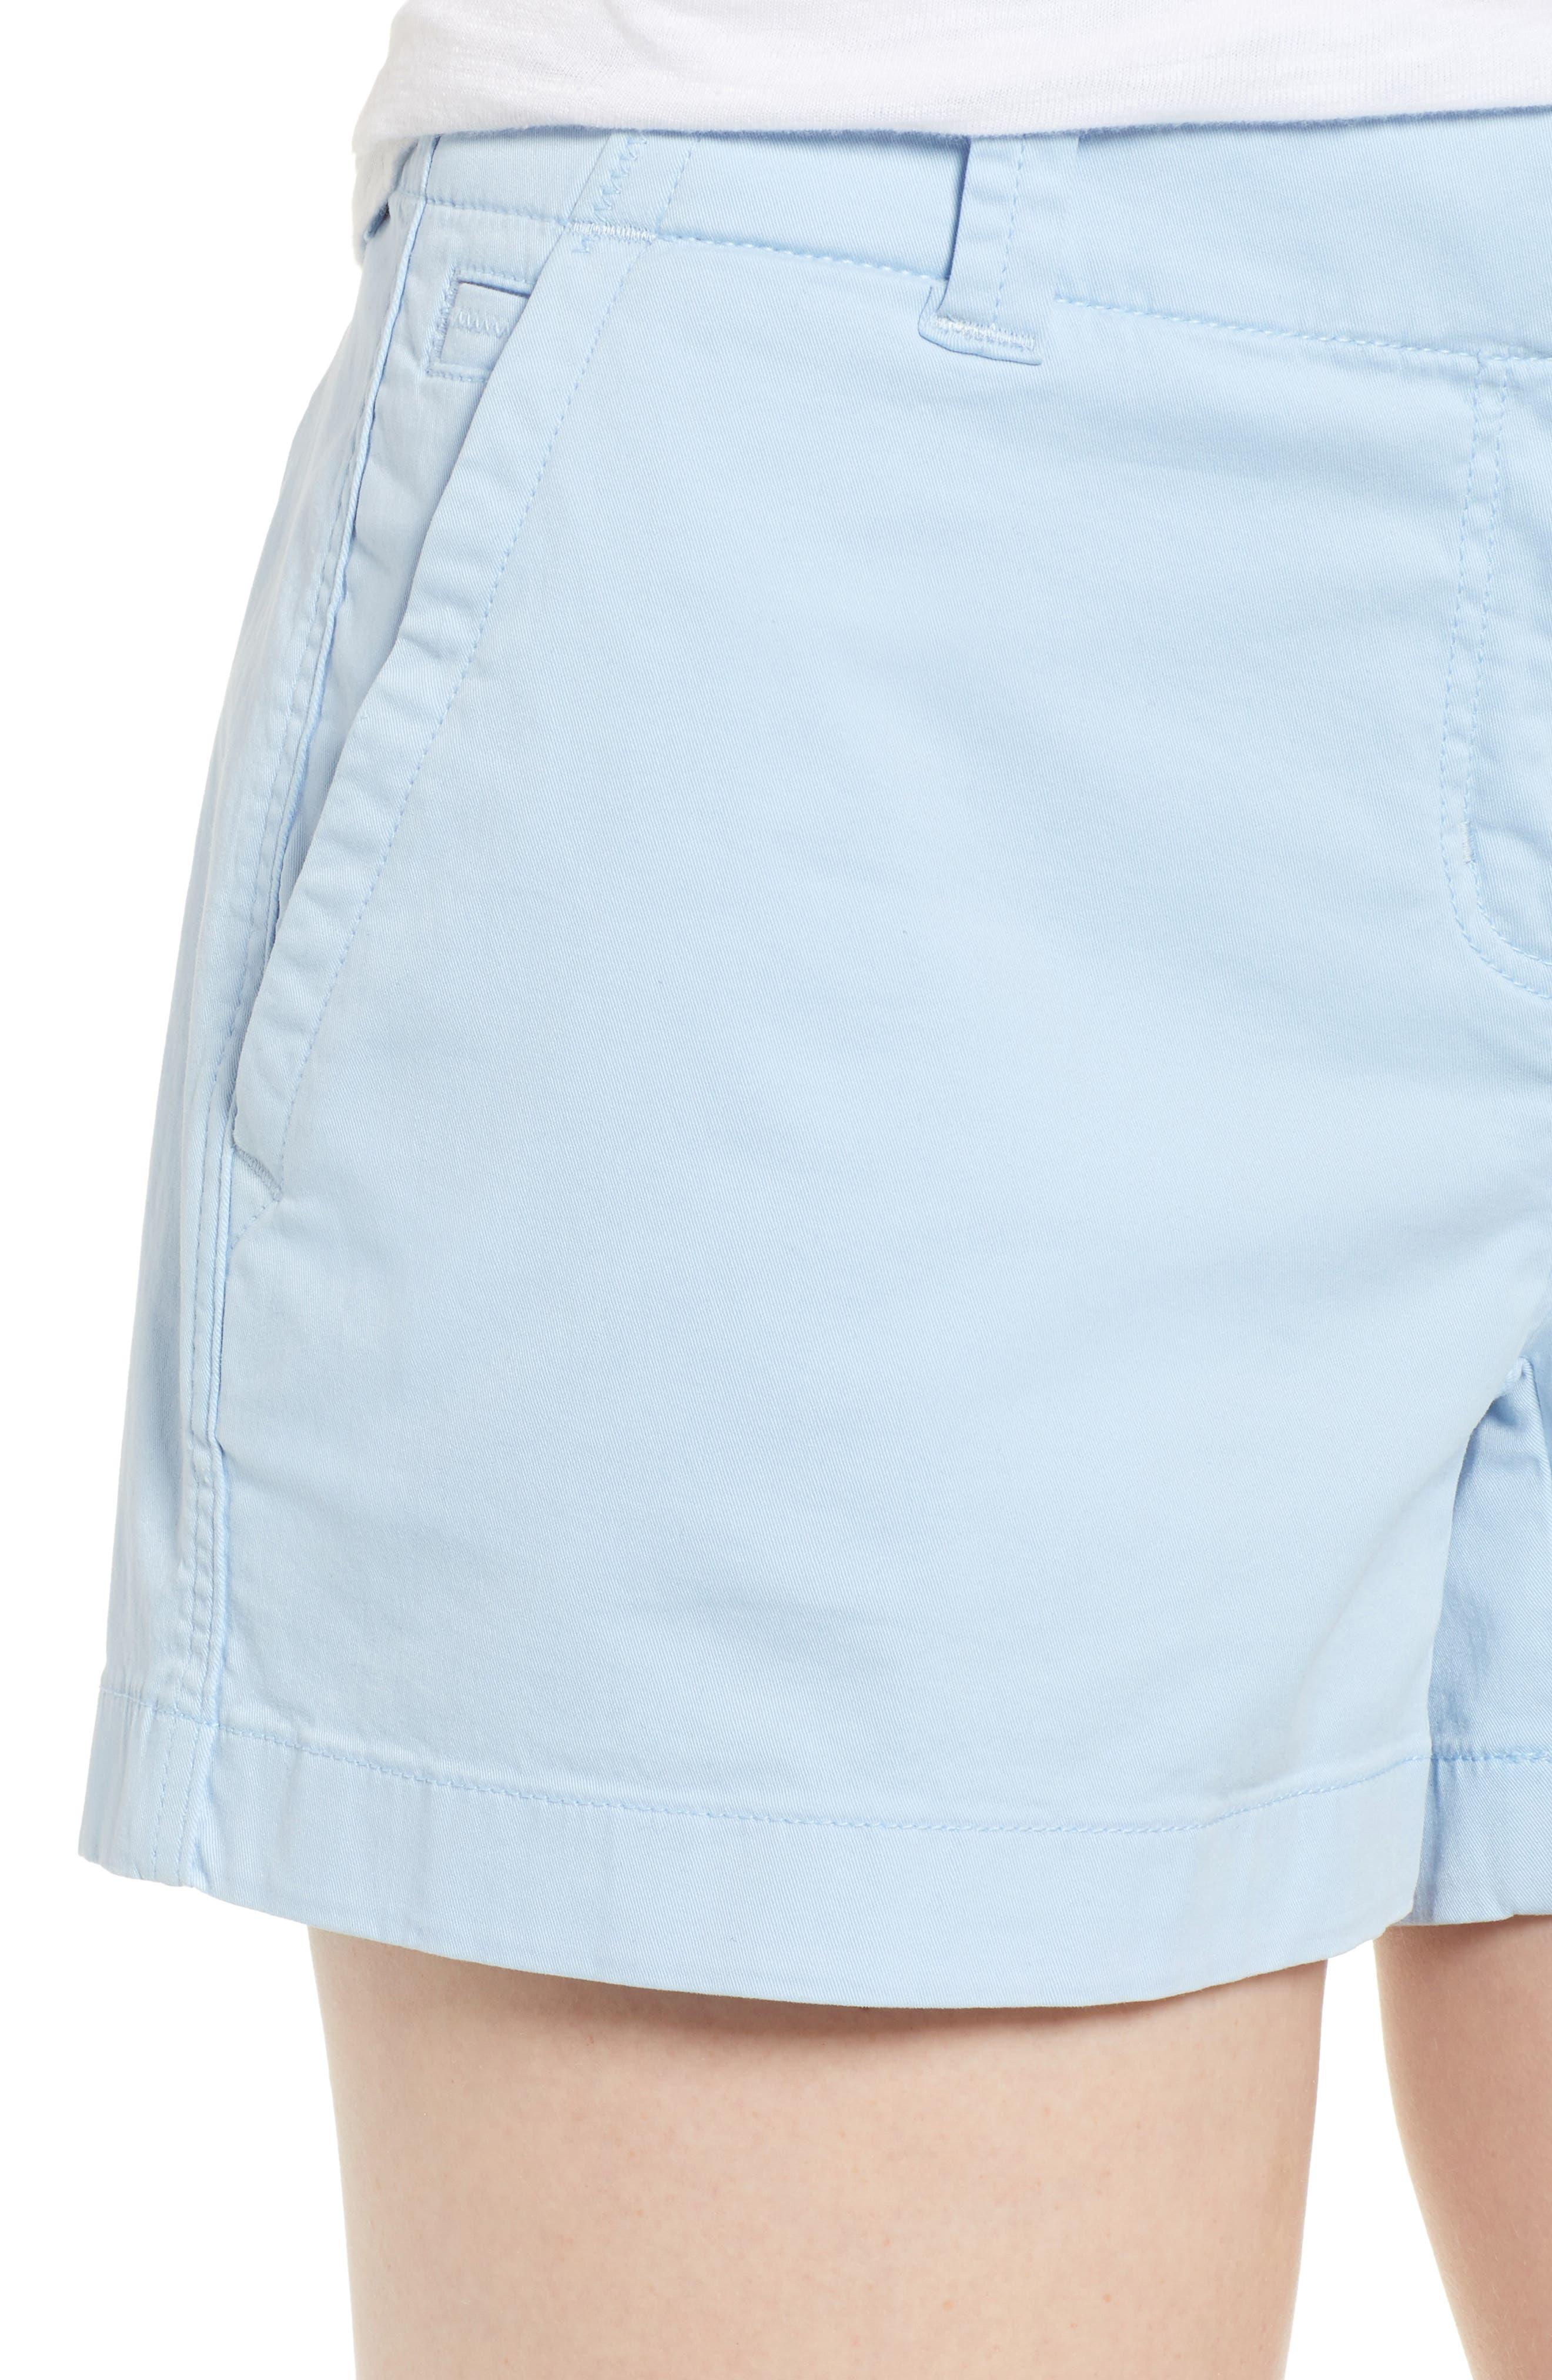 Everyday Stretch Cotton Shorts,                             Alternate thumbnail 4, color,                             Jake Blue